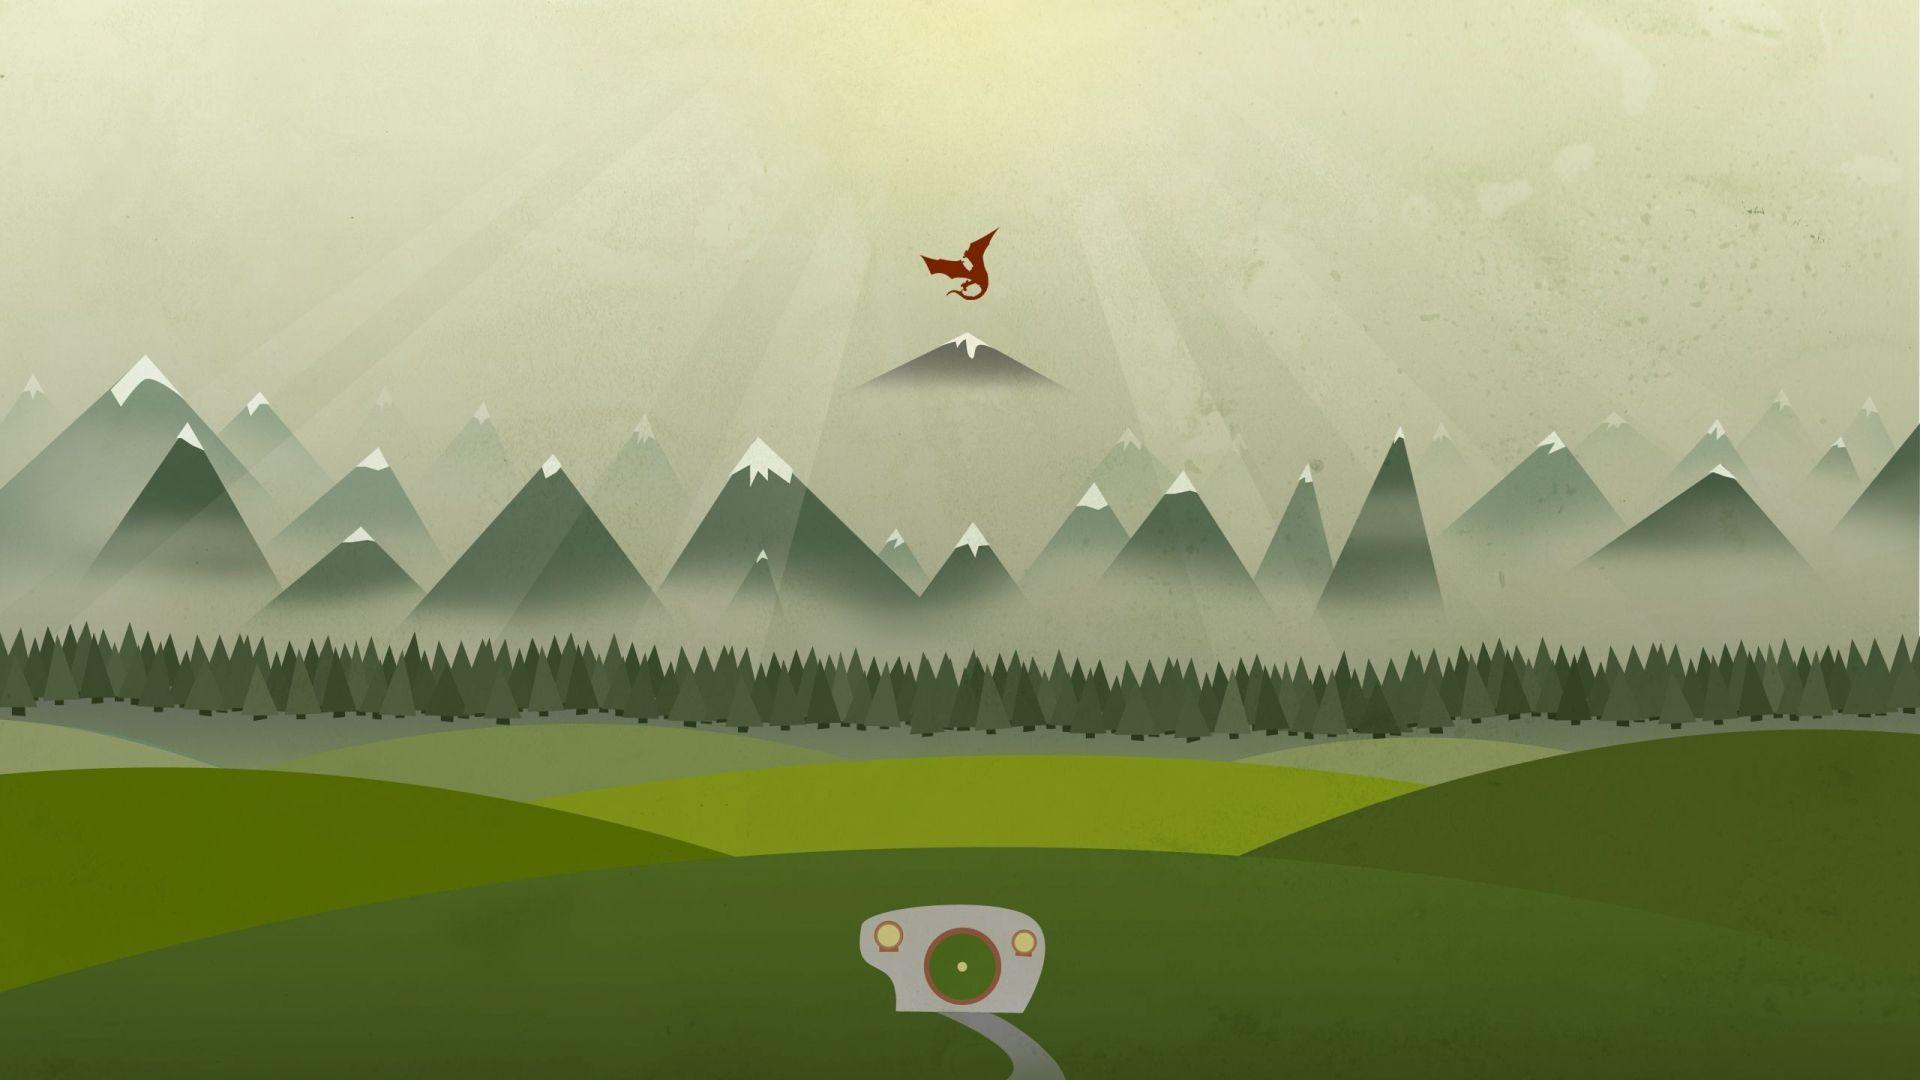 Wallpaper Dragon, mountains, minimal, landscape, abstract